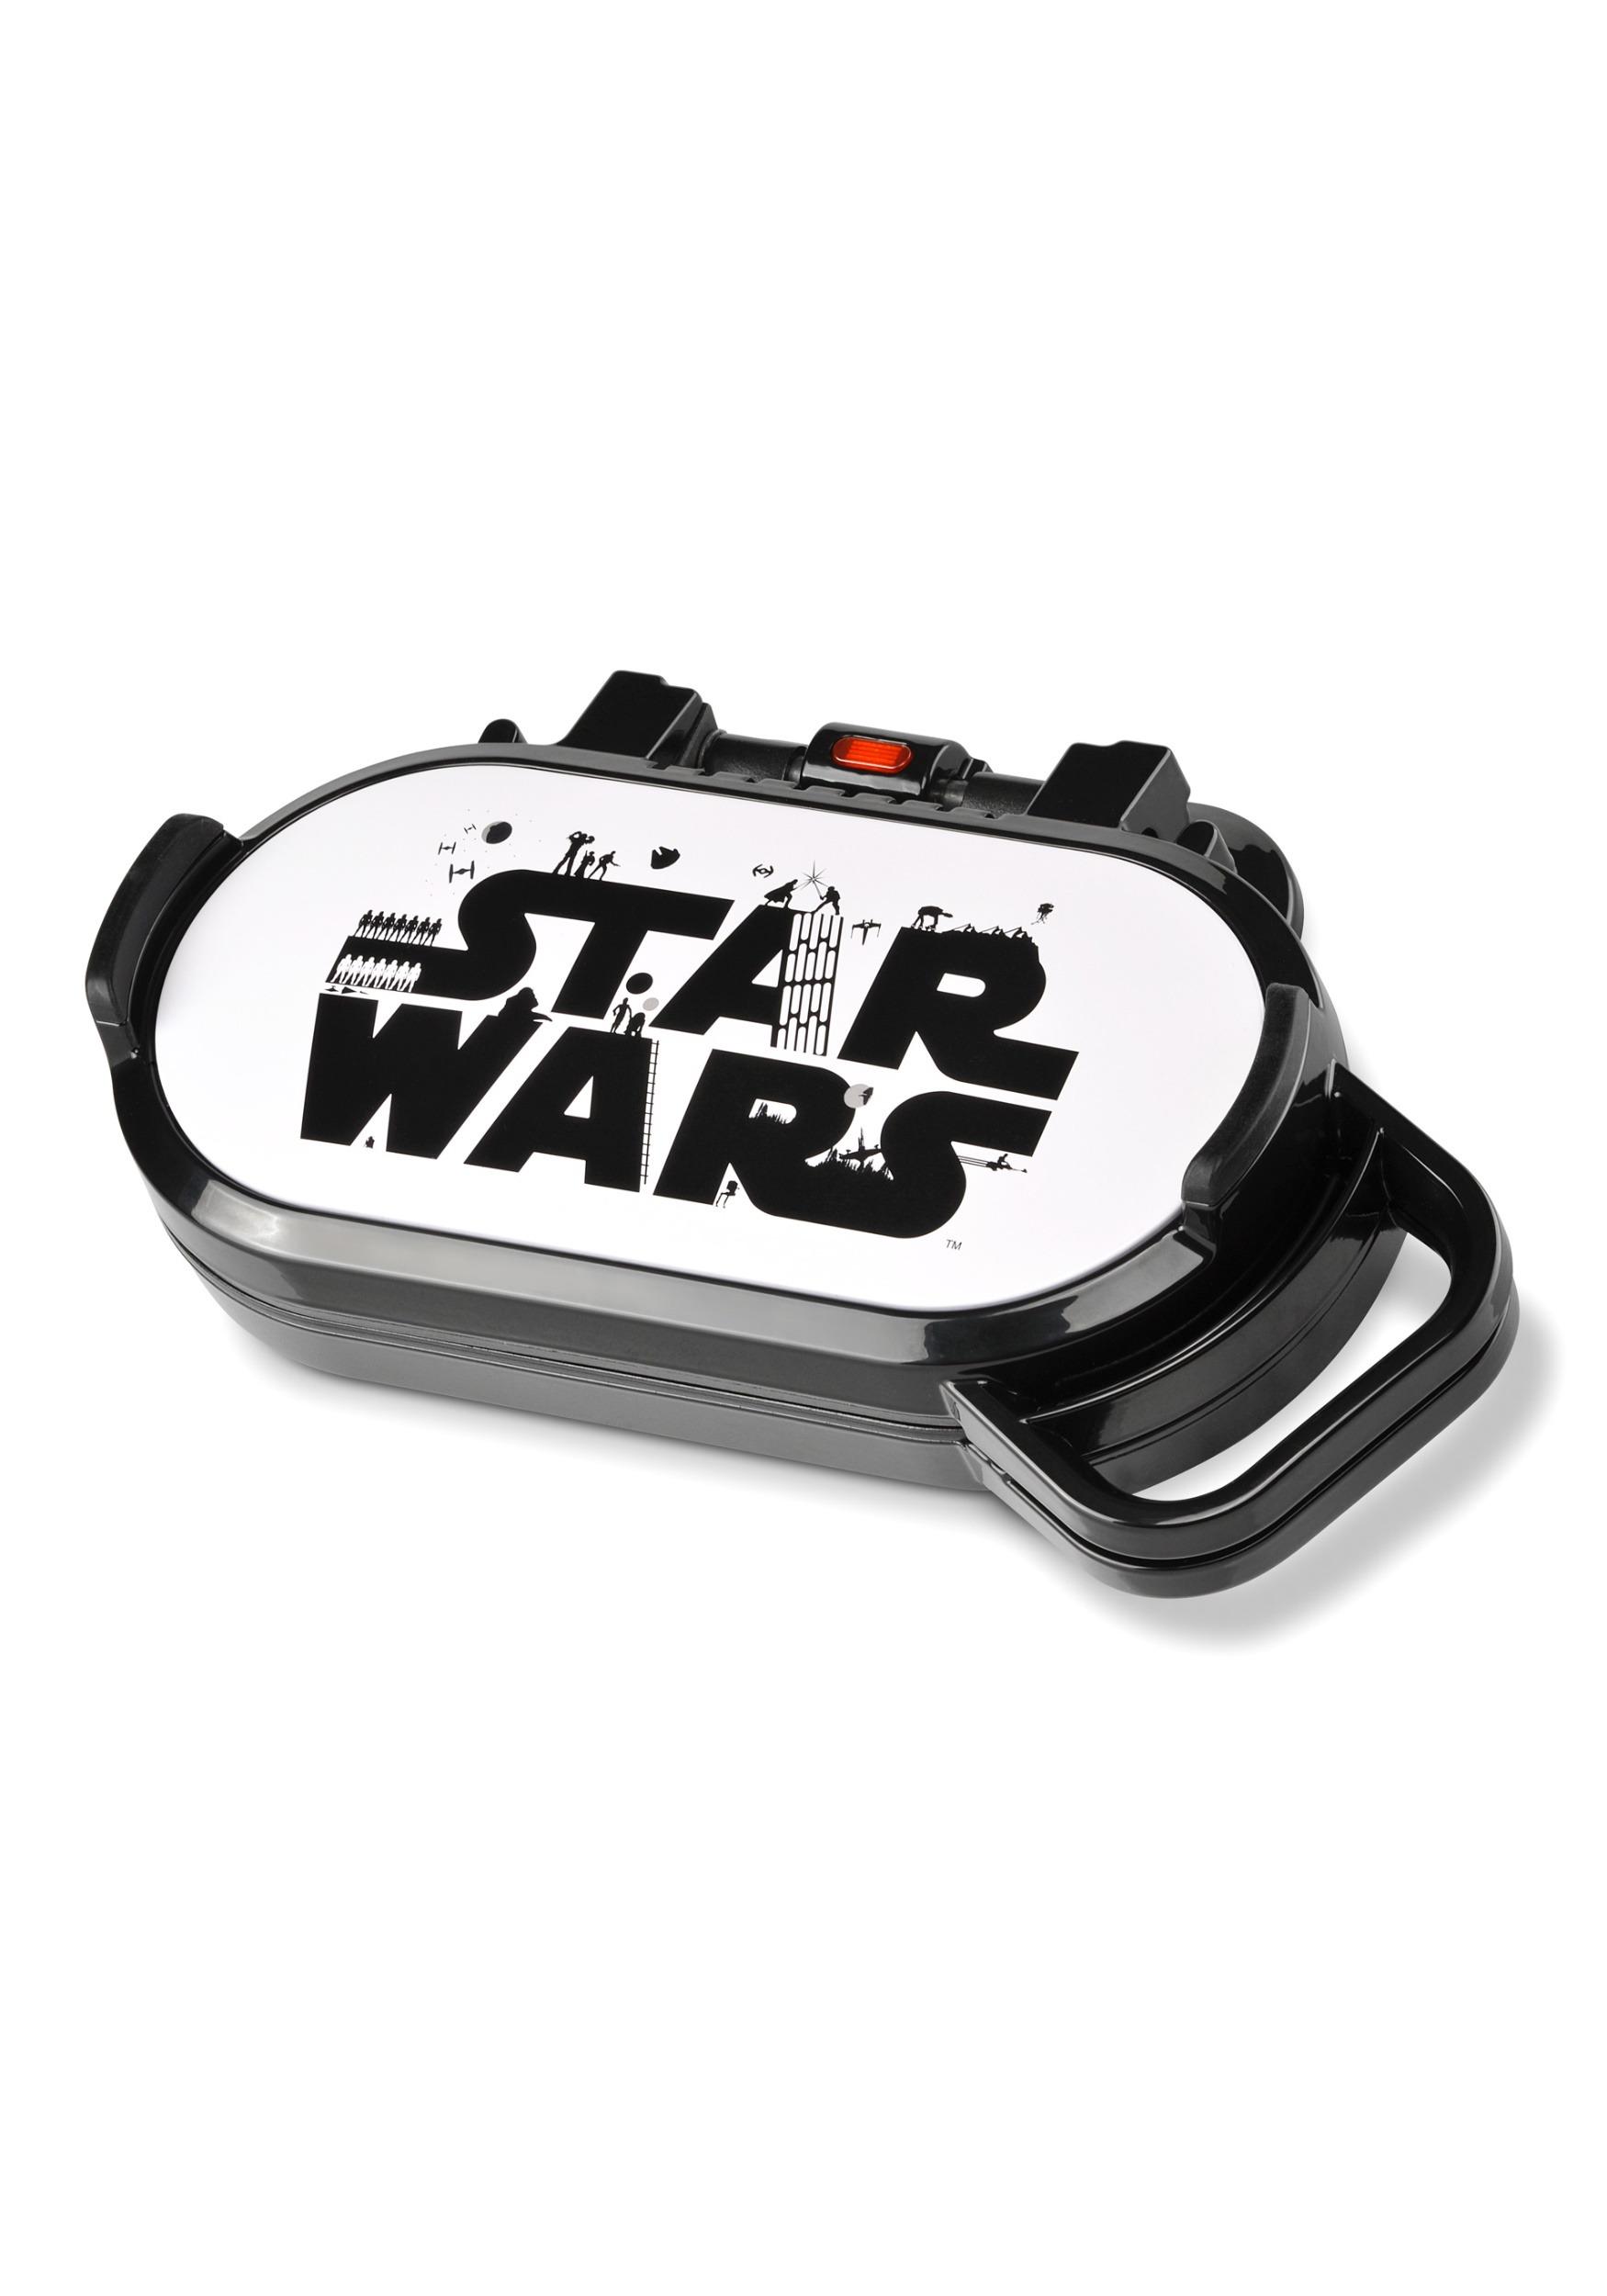 Flip Non-Stick Star Wars Pancake Maker